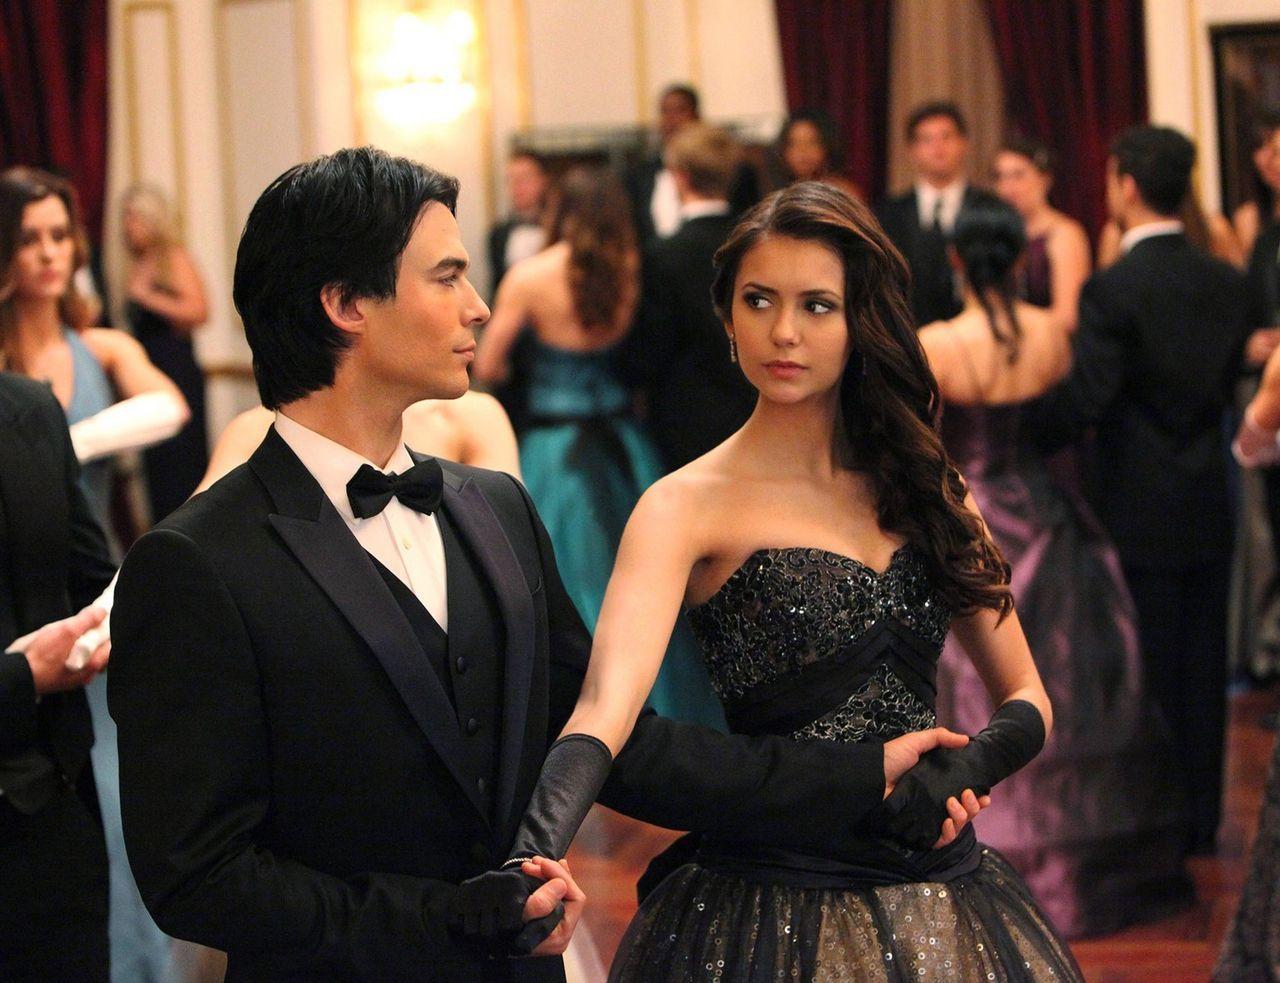 """The Vampire Diaries"" Star Ian Somerhalder Says Delena Fans Were Problematic, Prefers Stelena Instead"